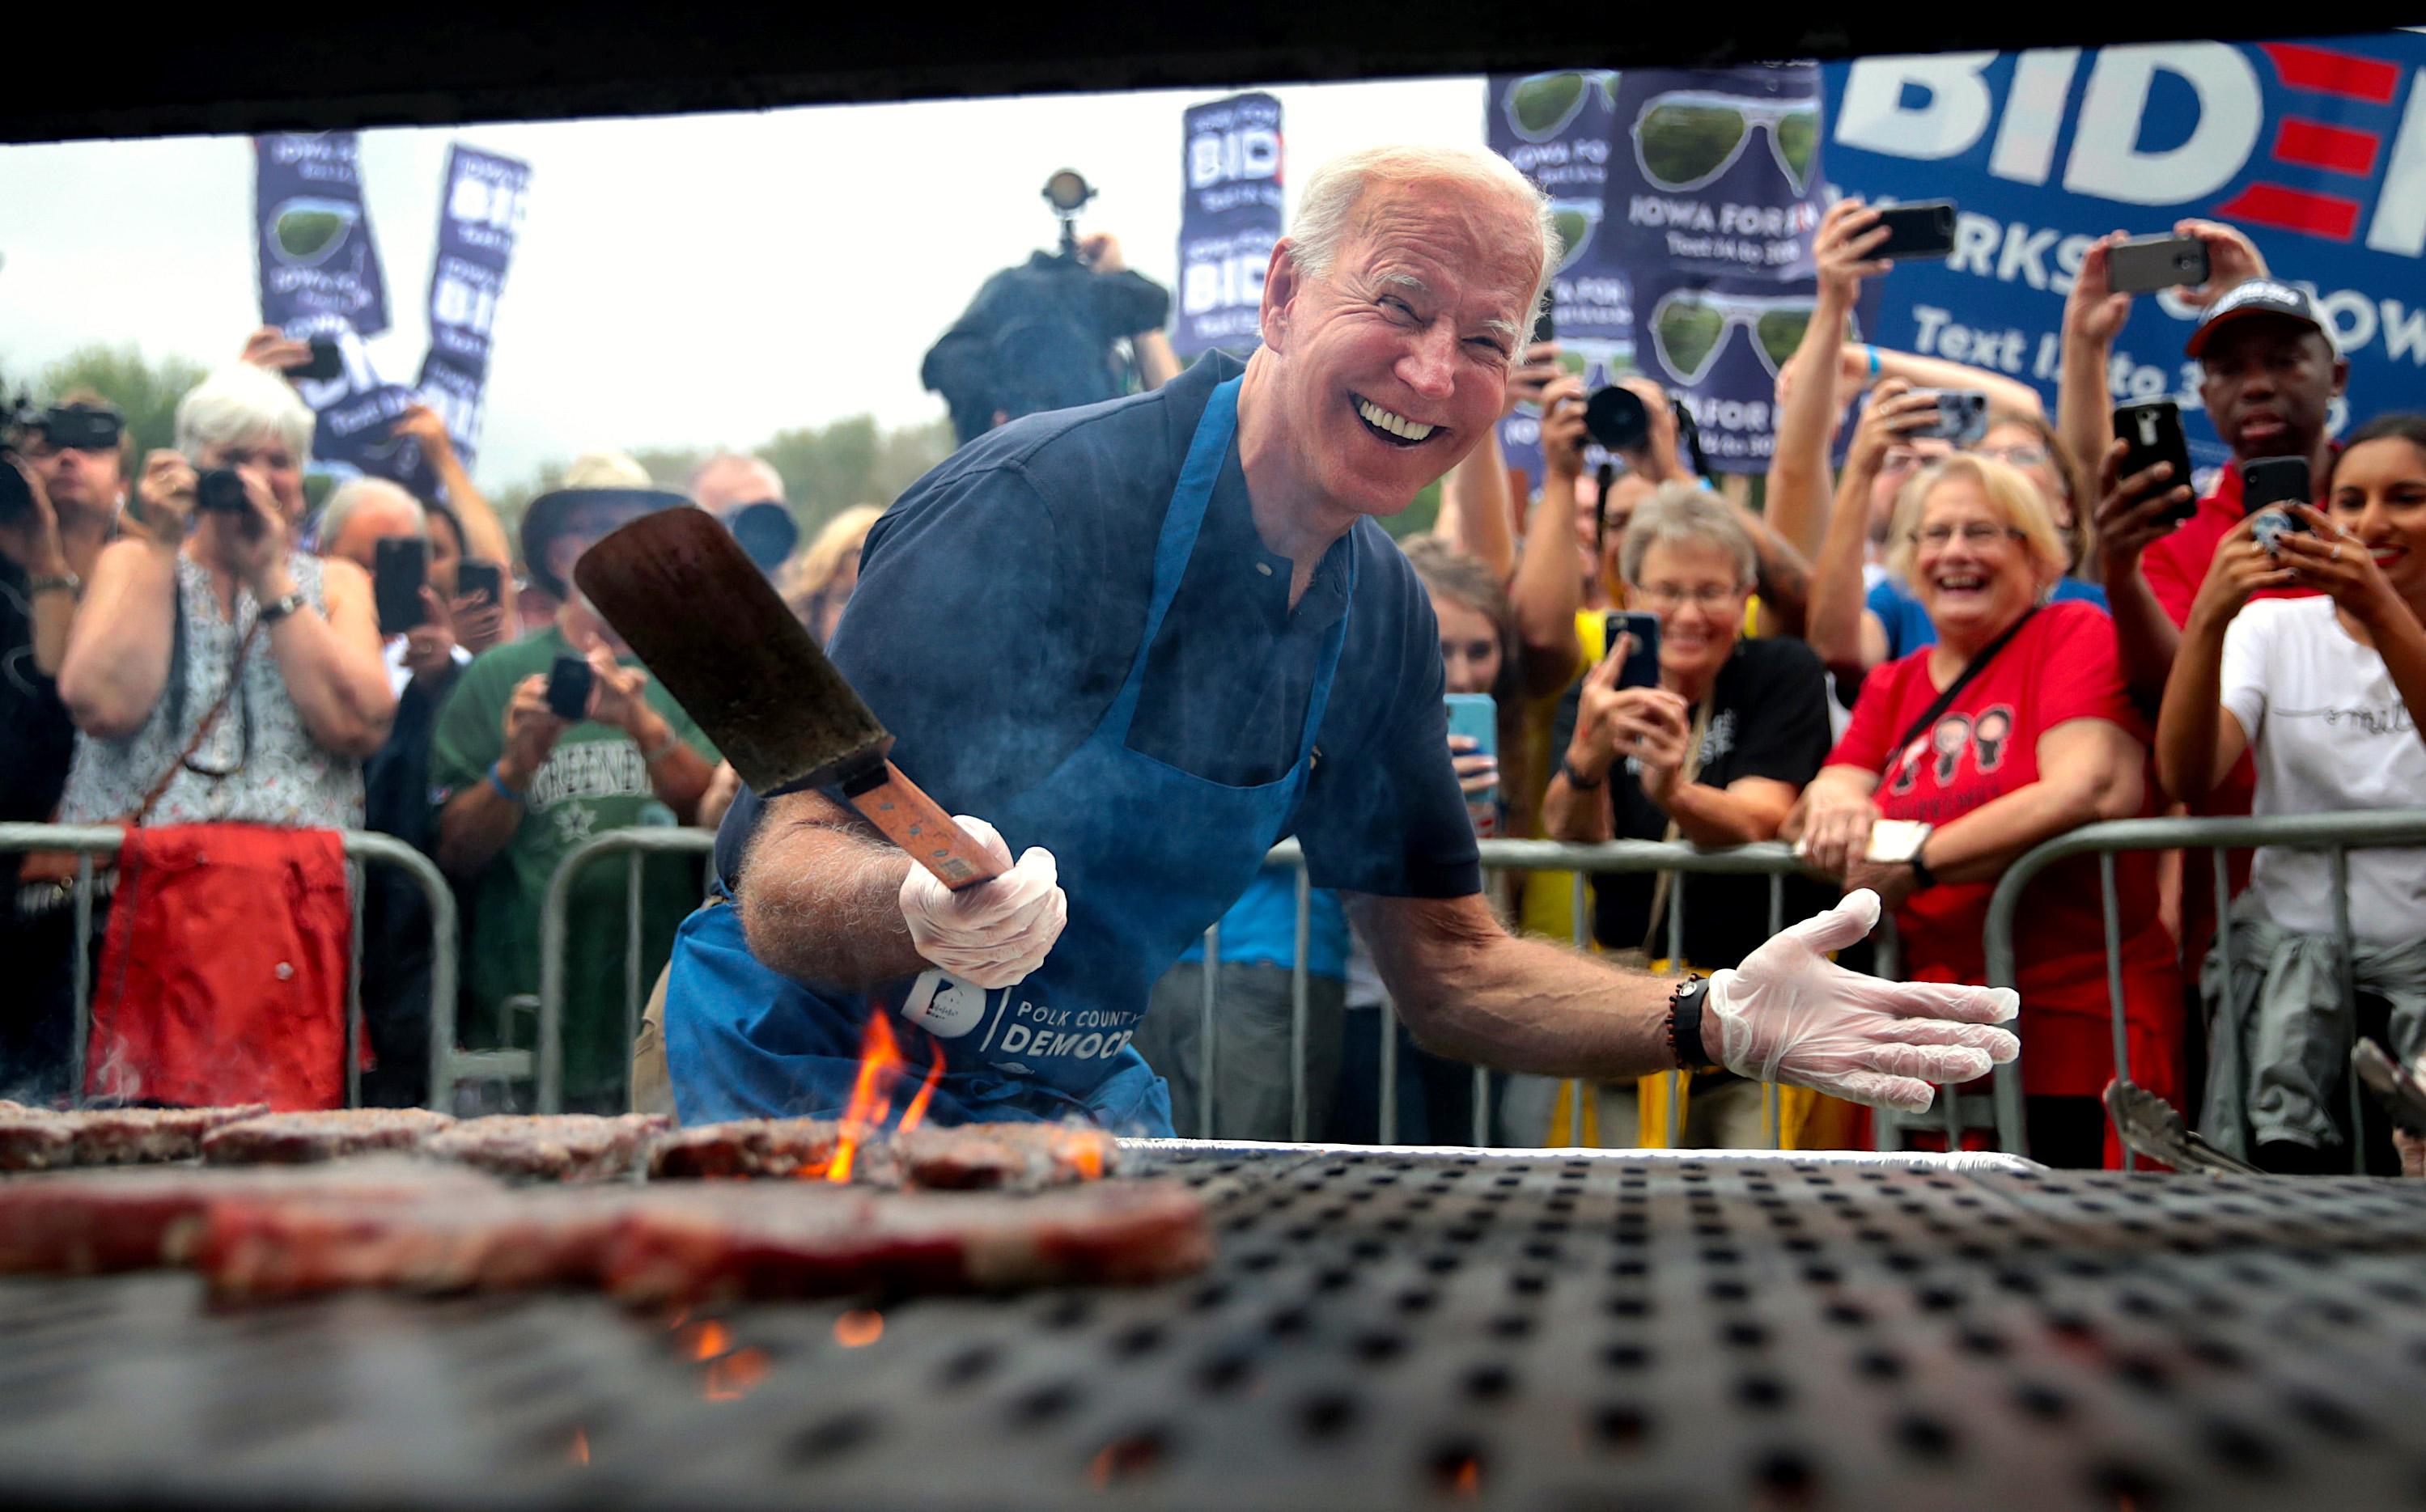 Joe Biden grills burgers on a grill at a campaign event.